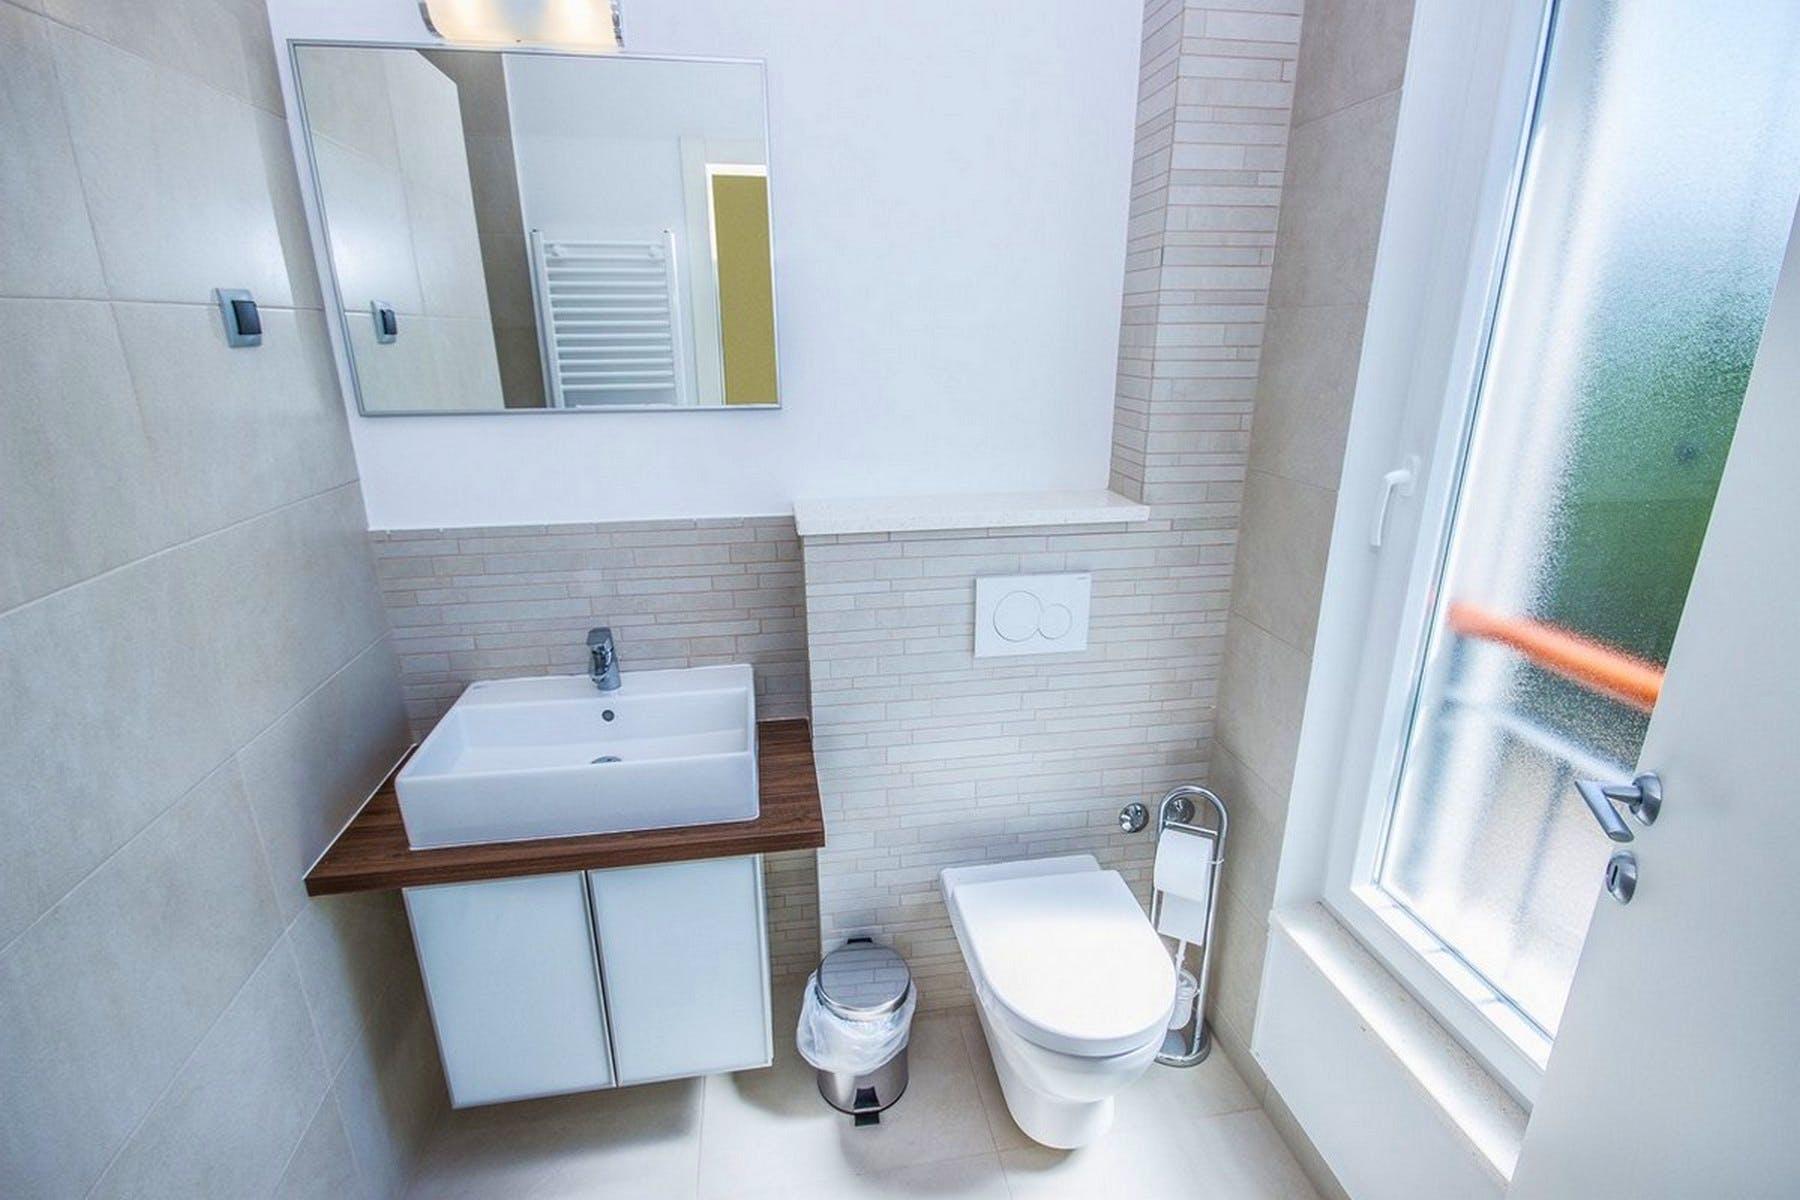 Modern design of the bathroom